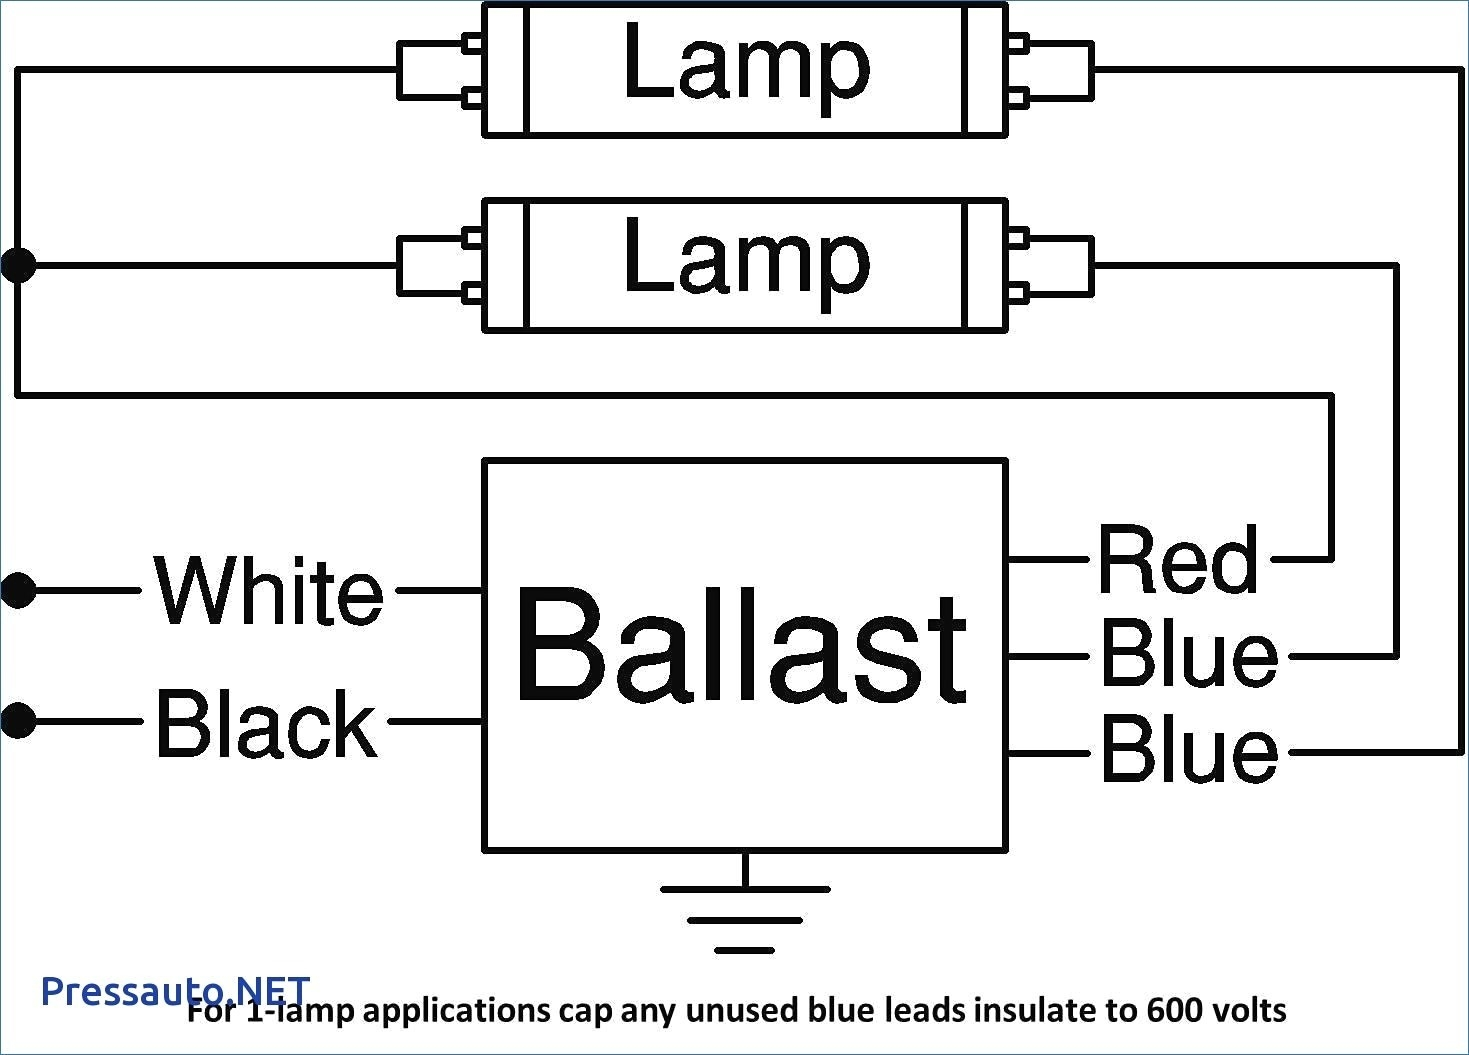 277v wiring diagram leviton cat6 jack 277 volt lighting best